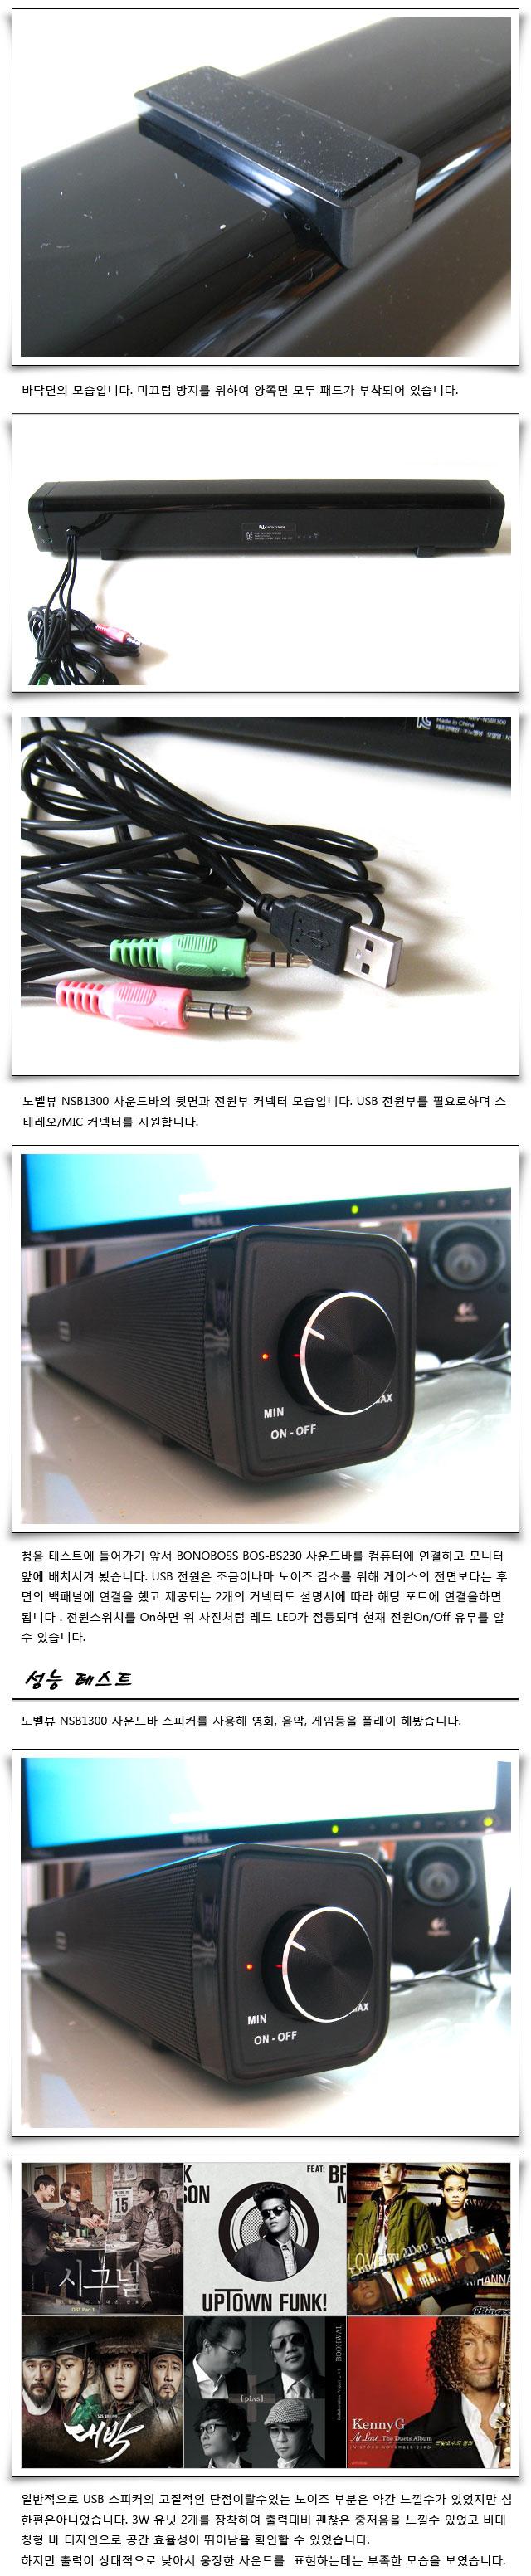 NSB1300_05.jpg